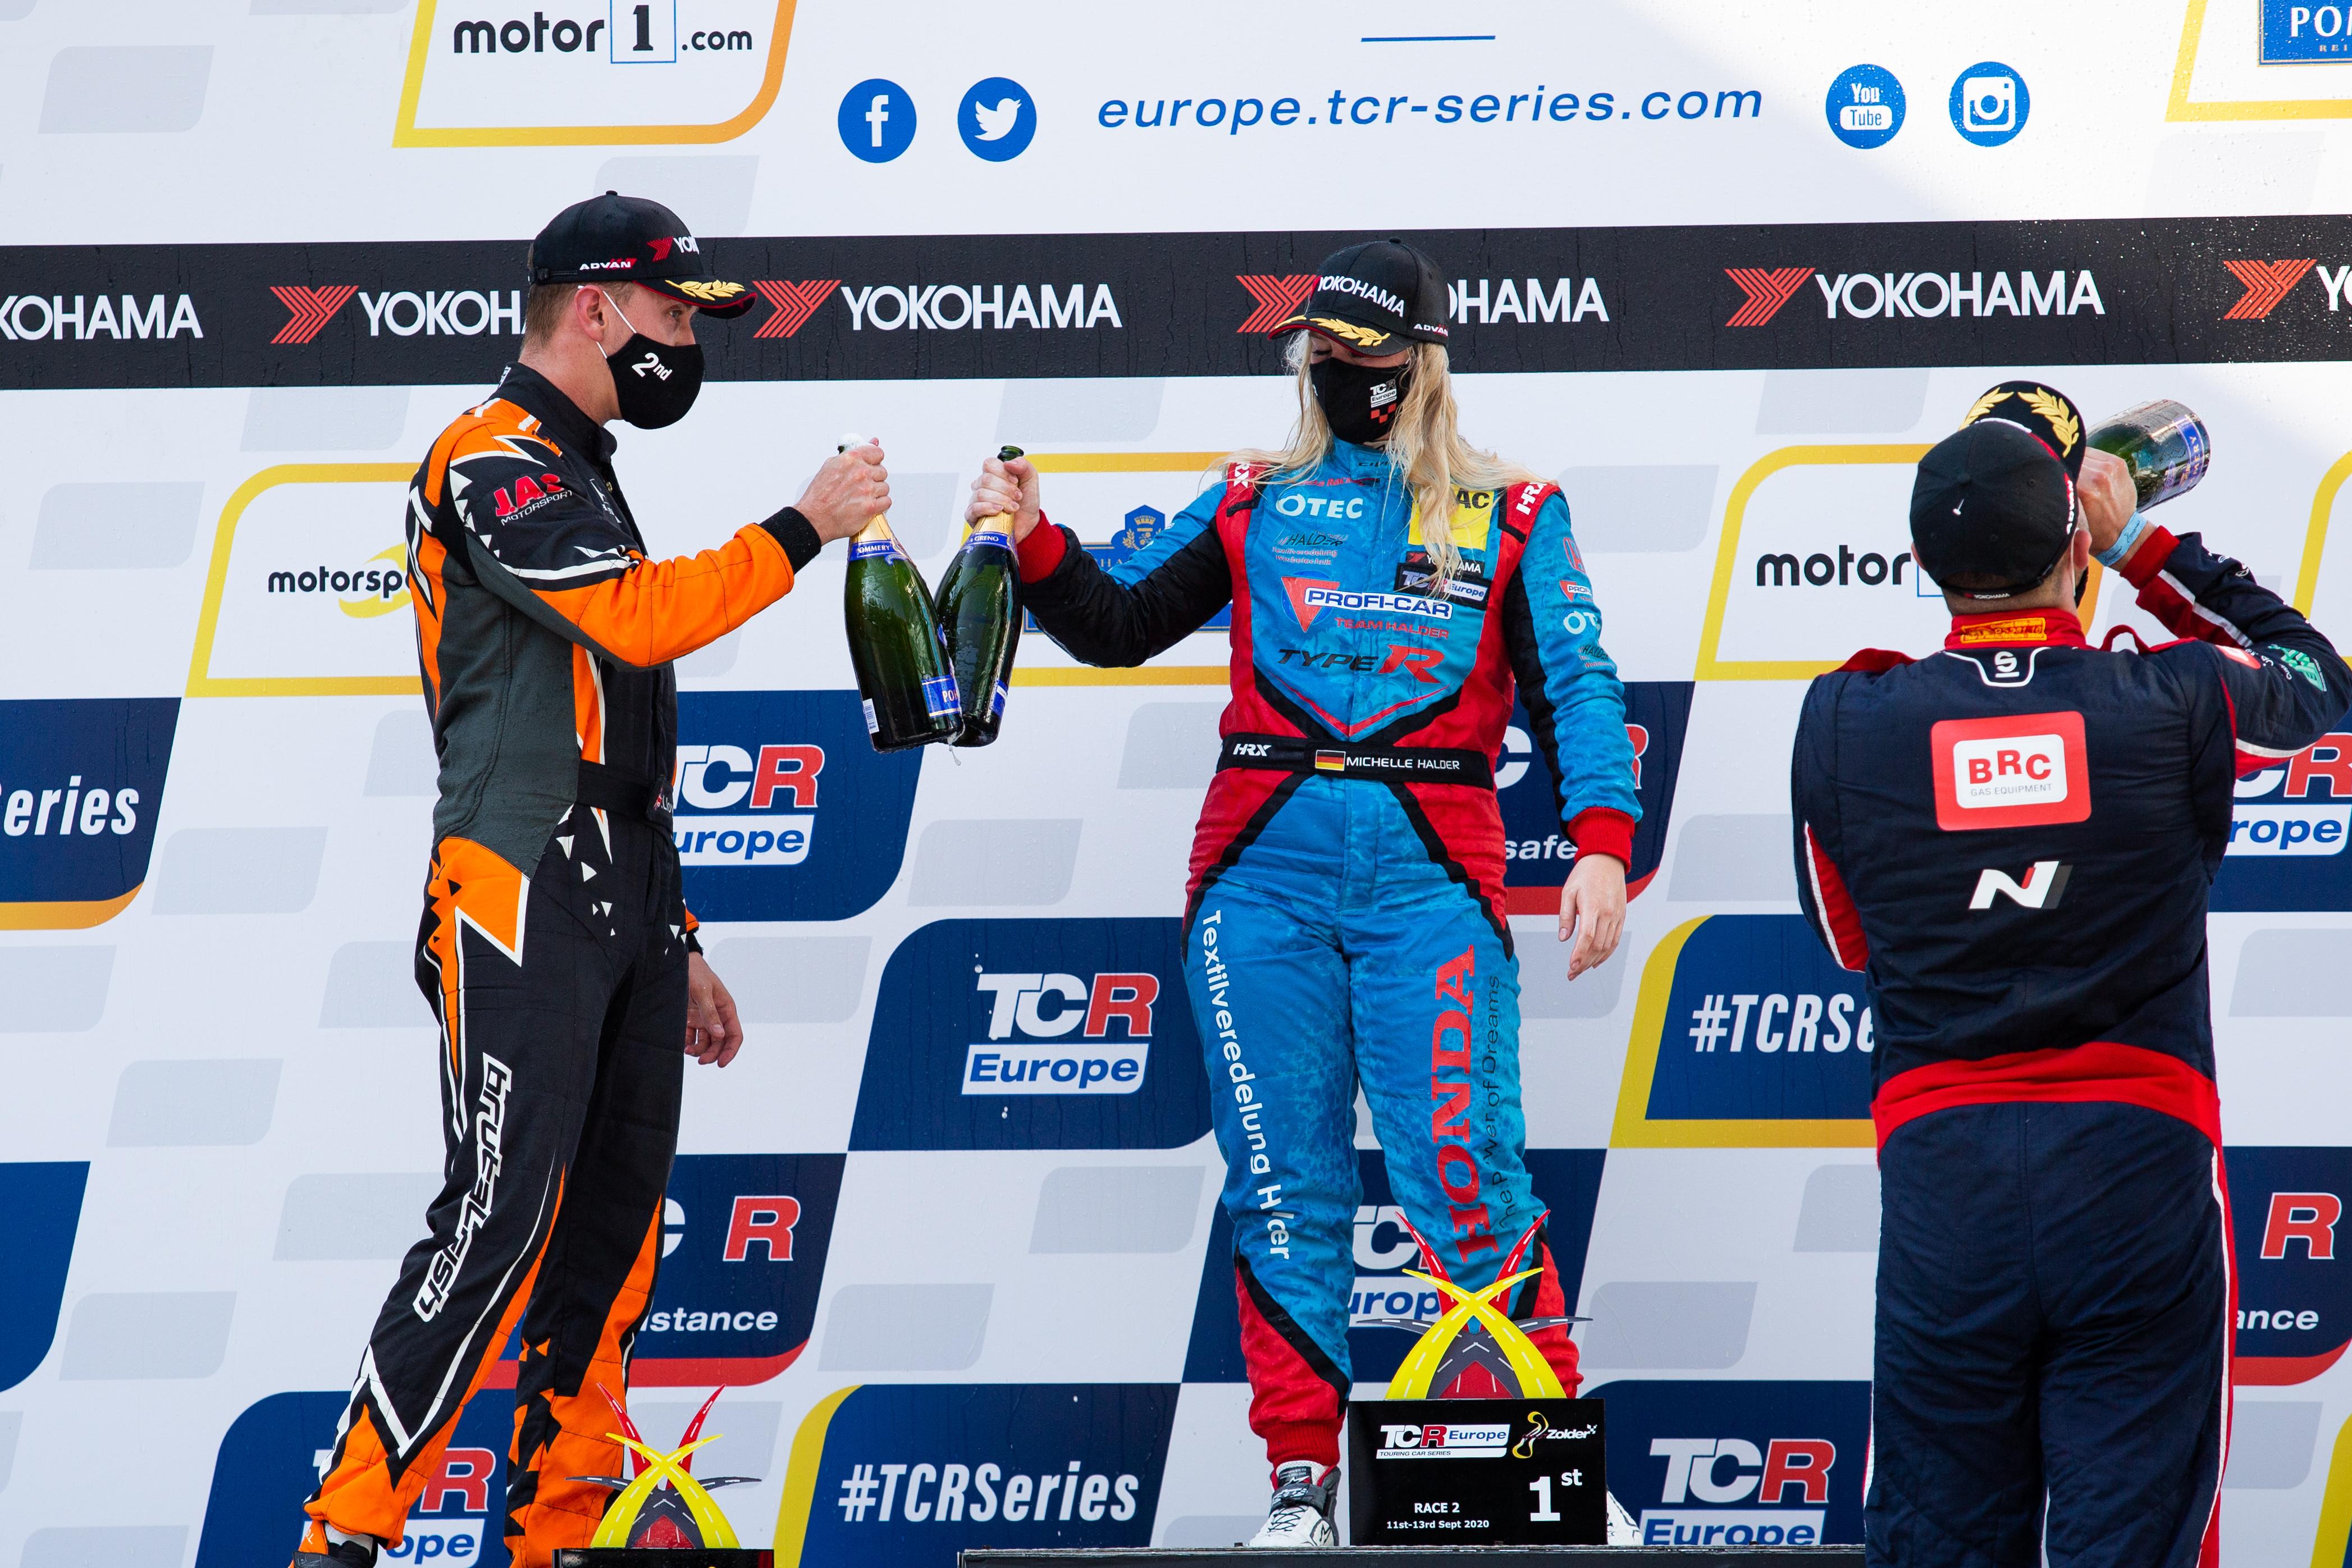 2020-2020_zolder_race_2---2020_tcr_europe_zolder_race_2_podium_68.jpg